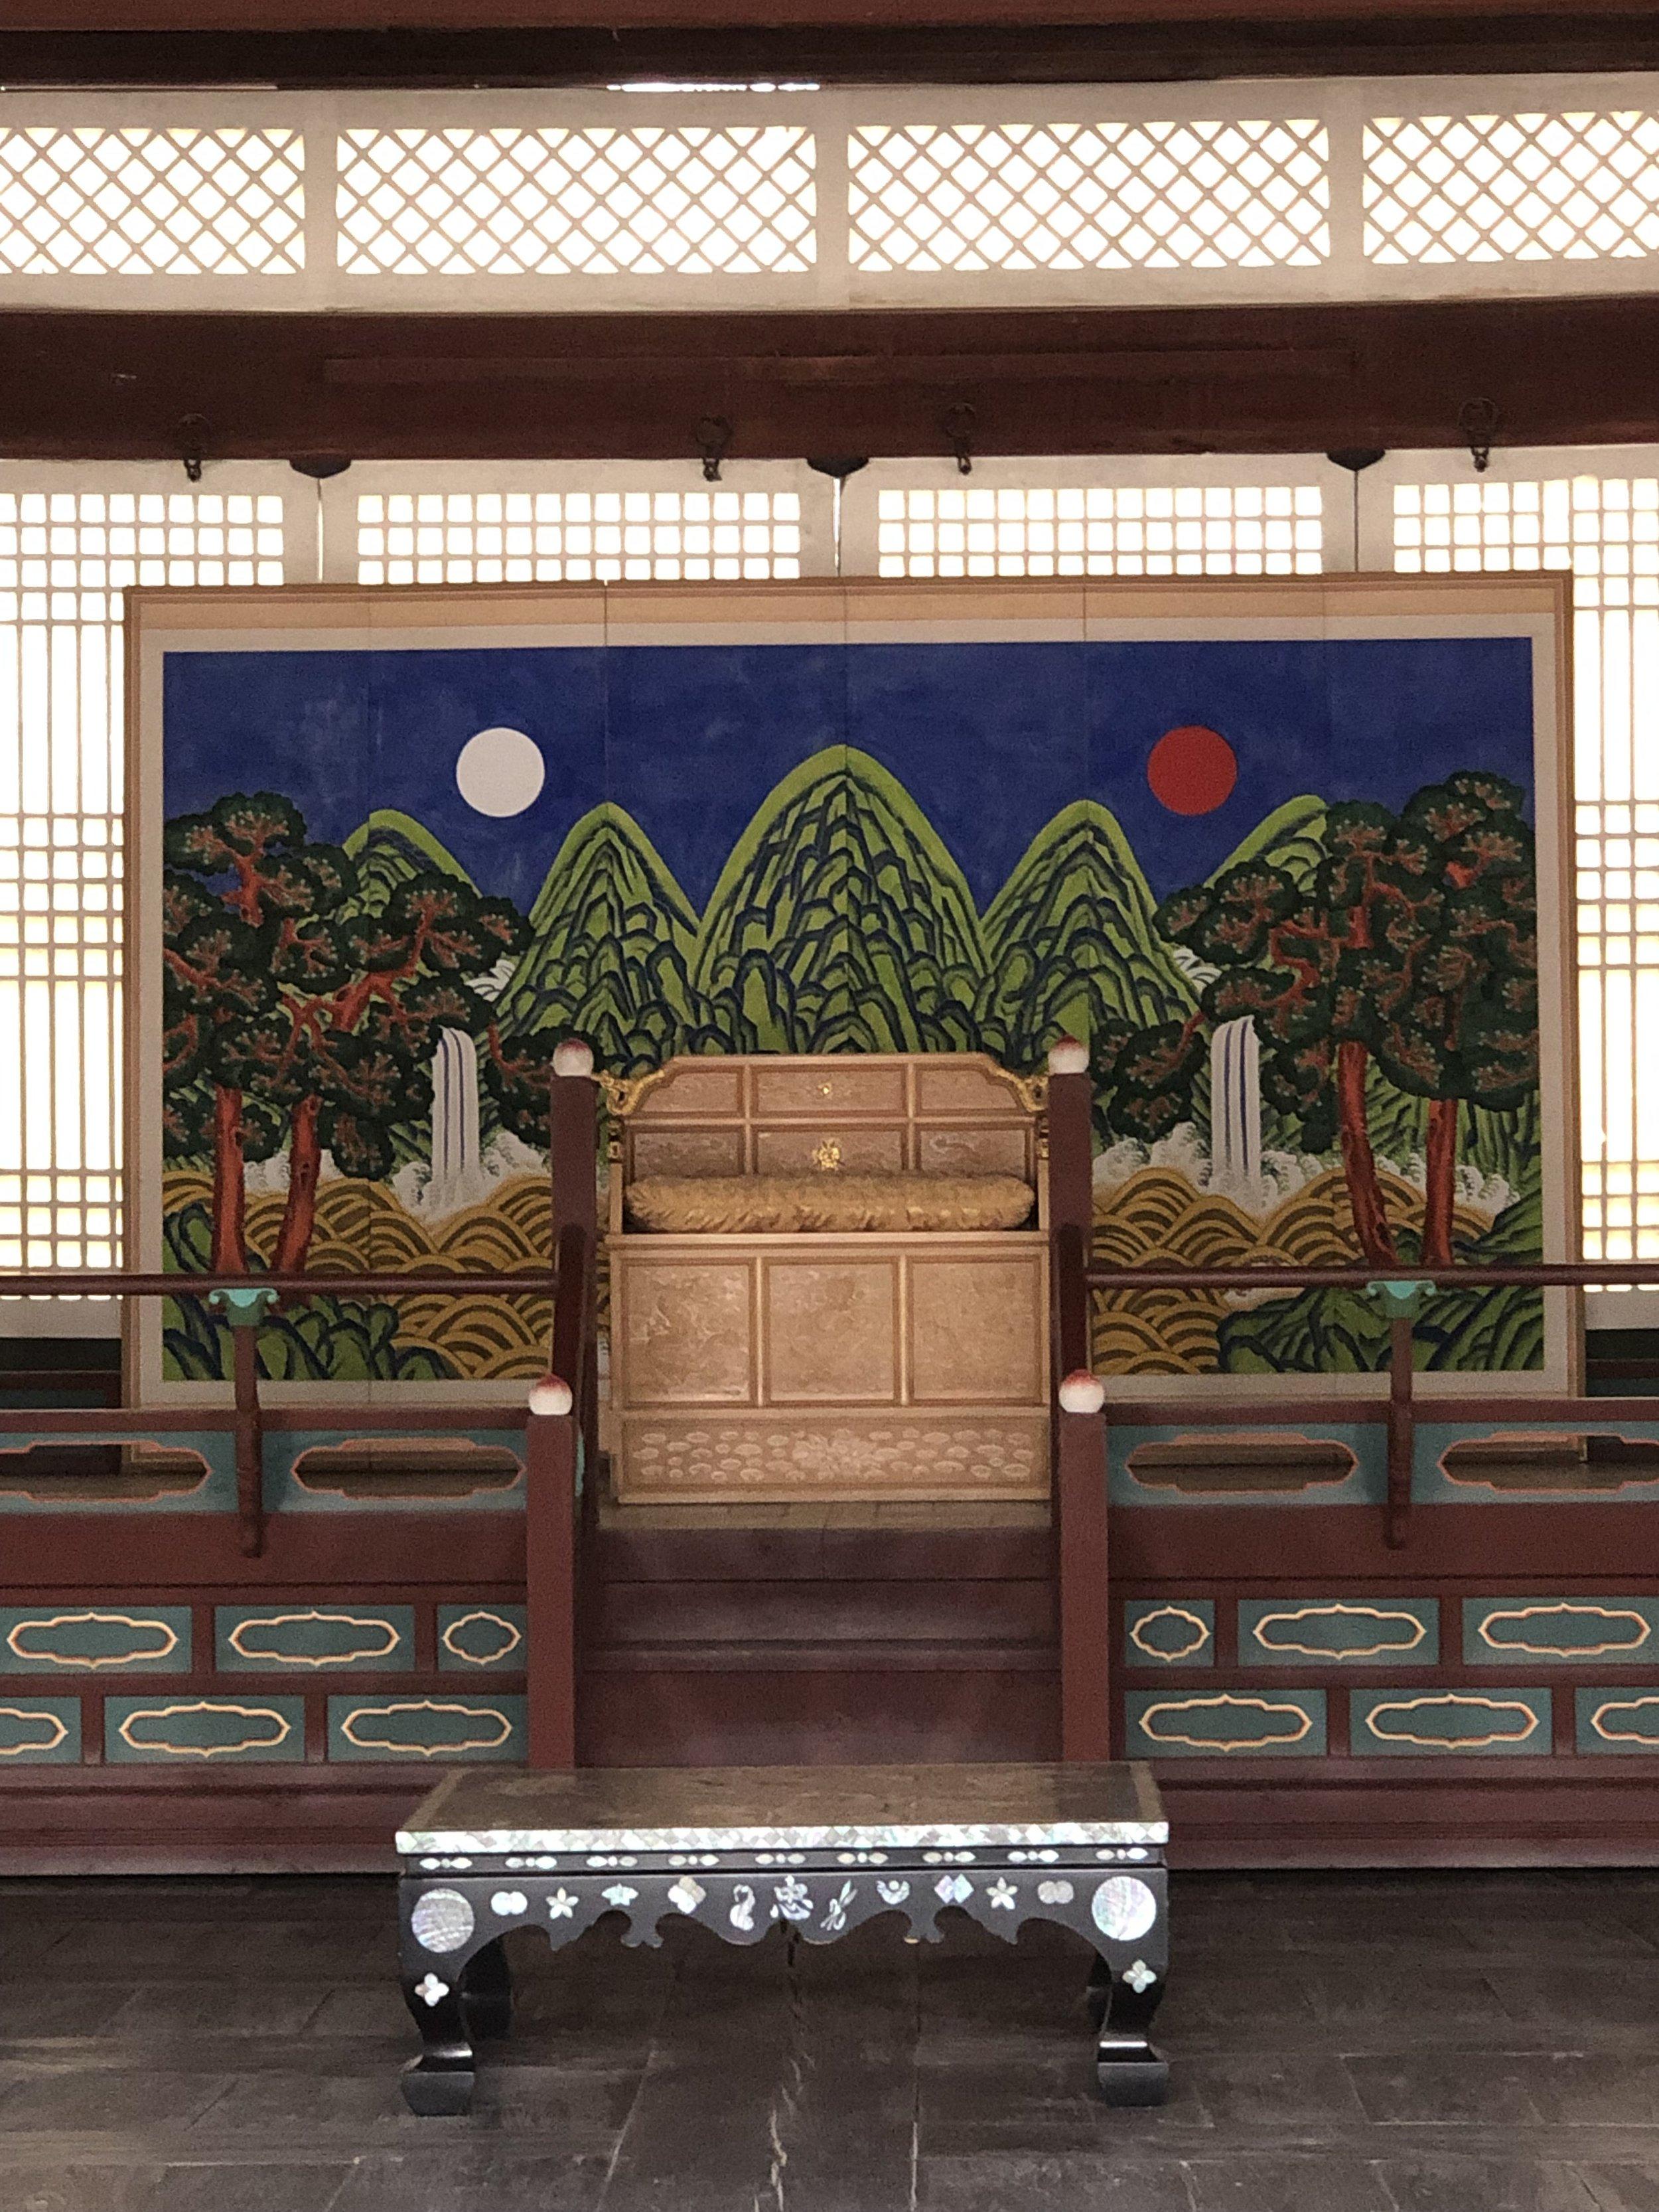 The national symbol of Korea at Gyeongbokgung Palace (Seoul)